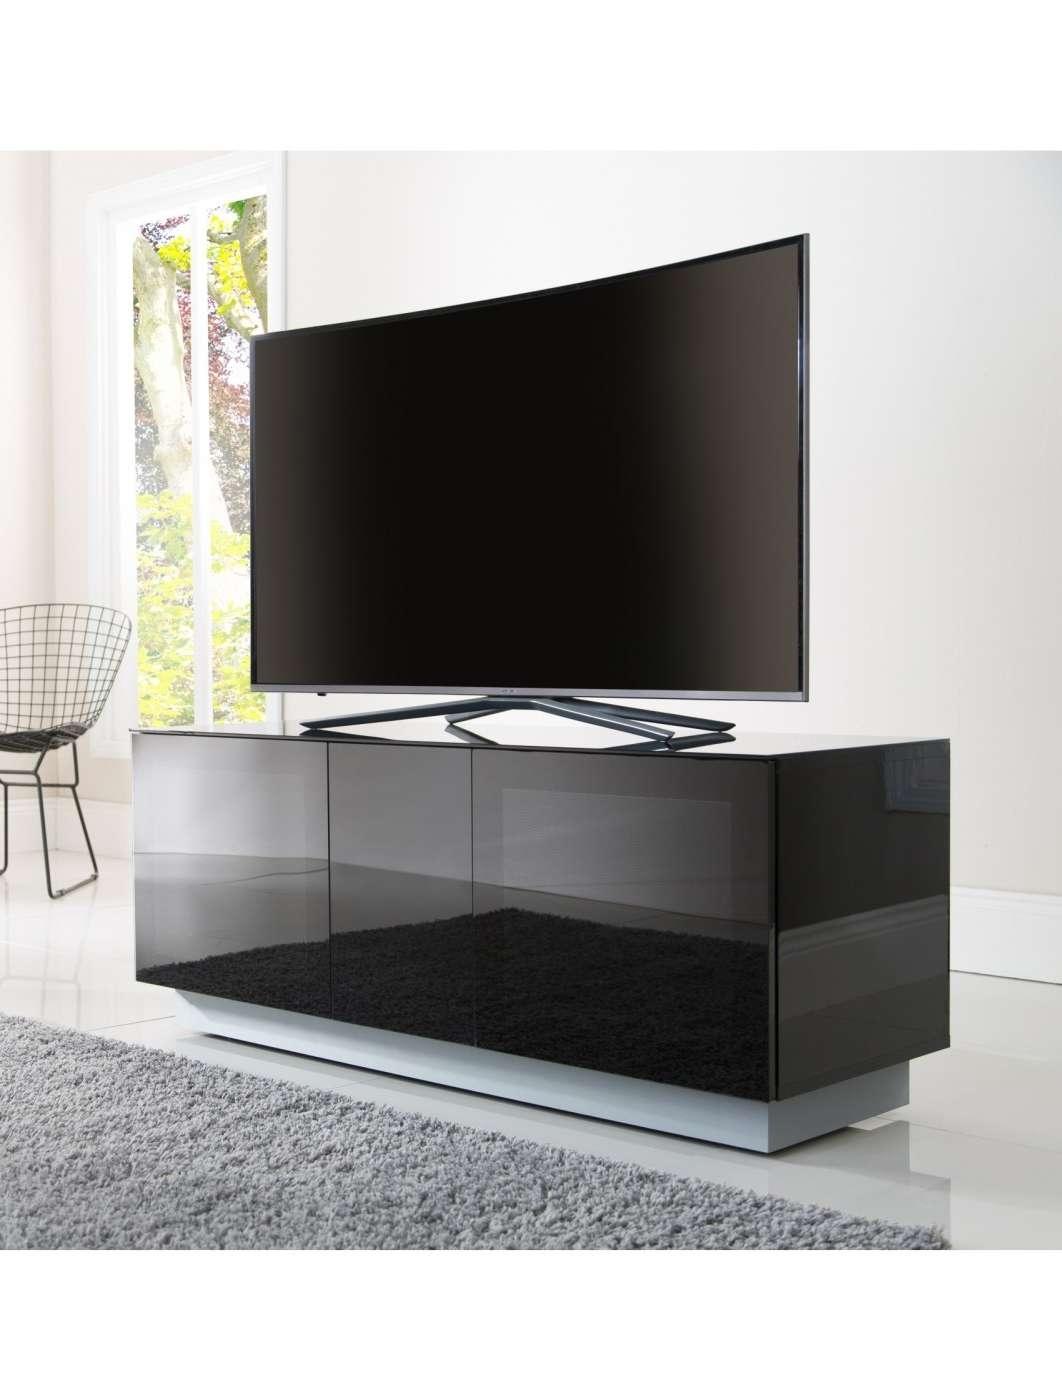 Alphason Emt1250xl Blk Element Modular Tv Stand   121 Tv Mounts Inside Alphason Tv Cabinets (View 19 of 20)